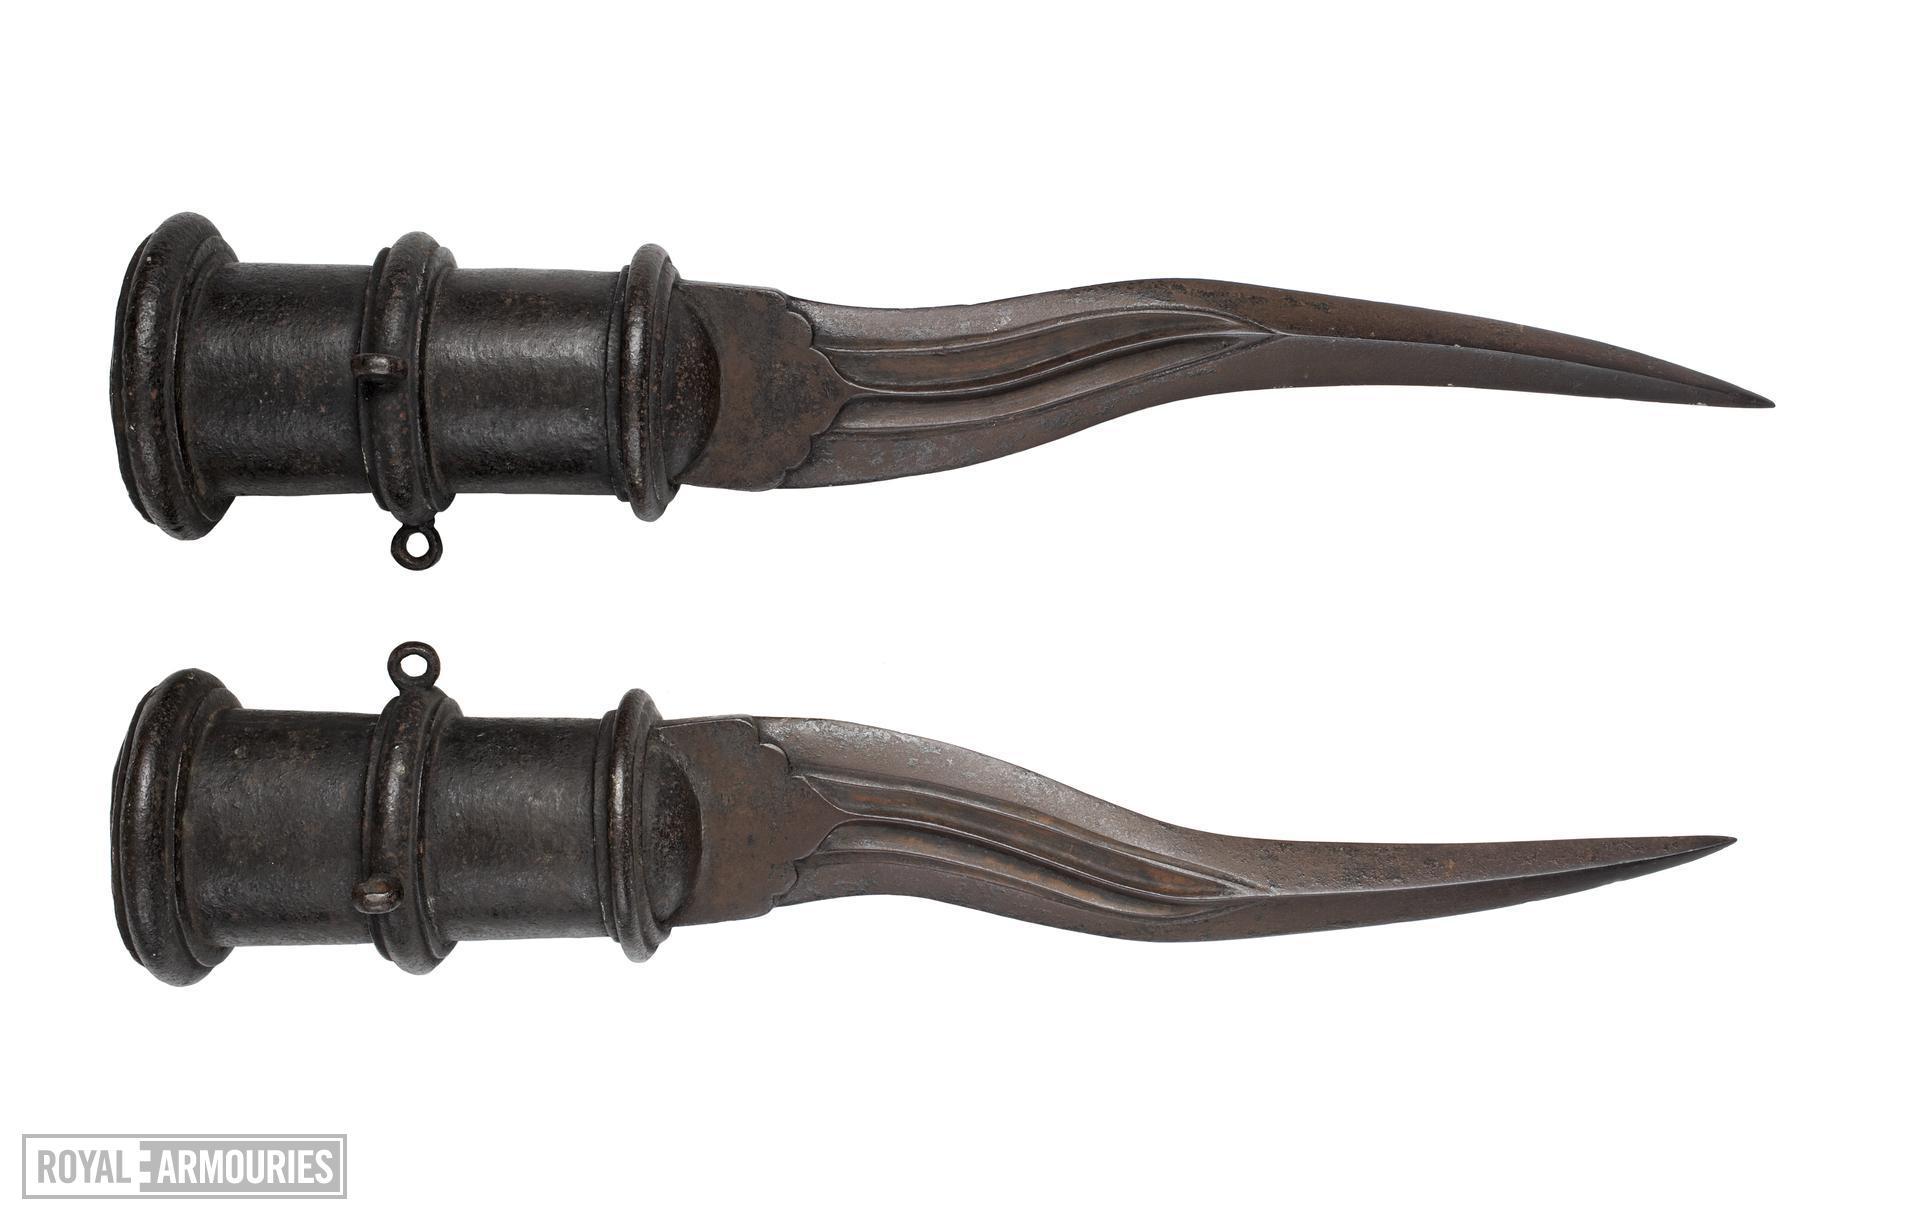 Pair of elephant tusk swords